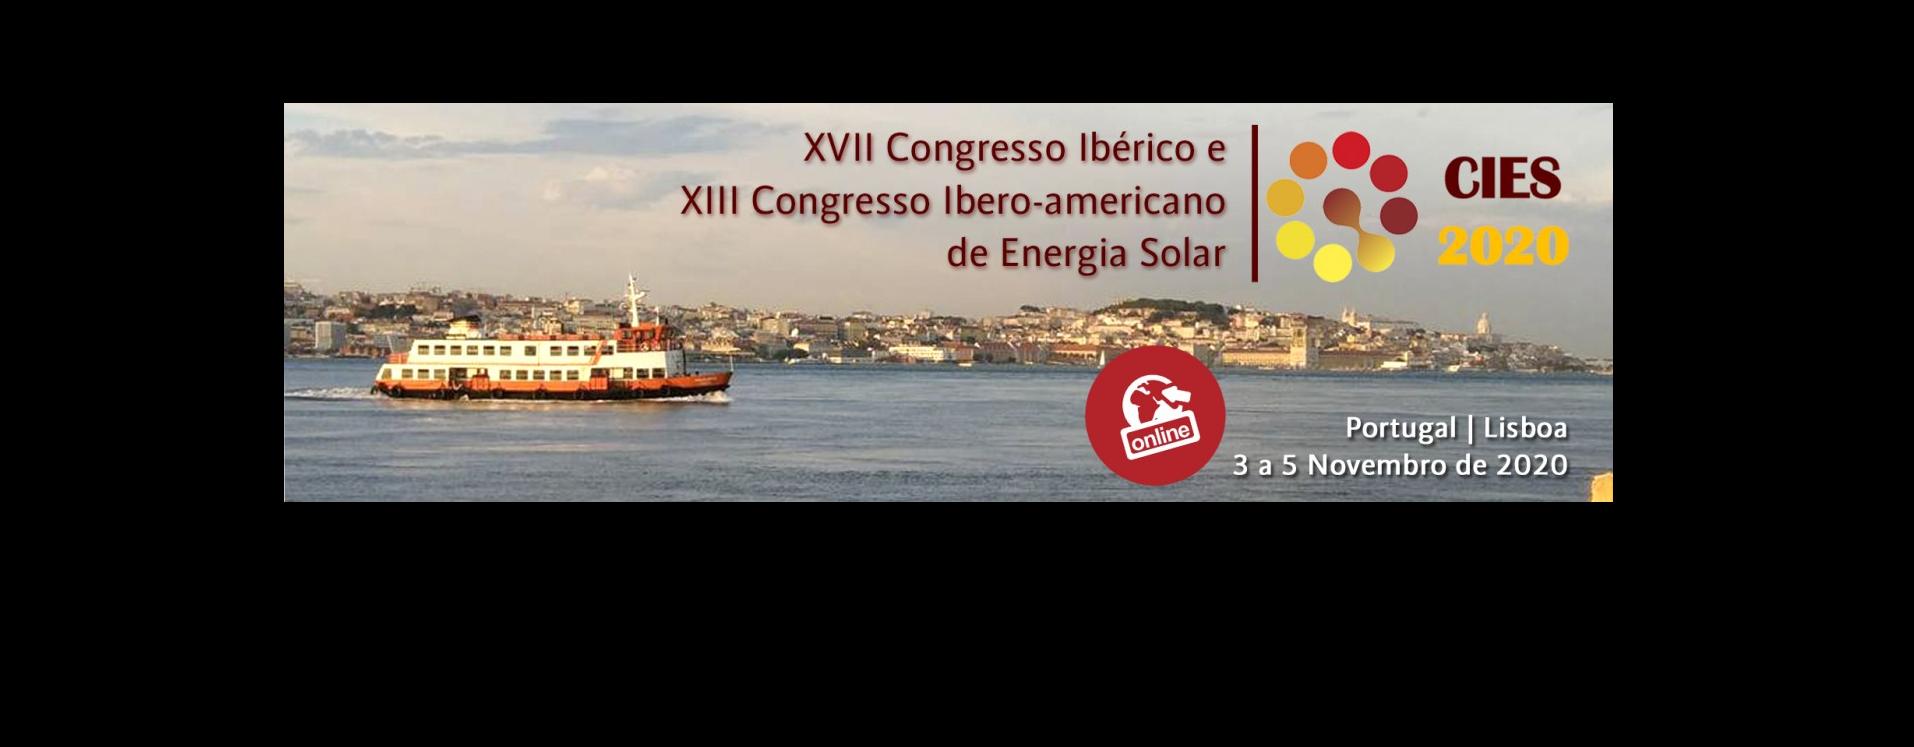 CIES2020: Conferência virtual